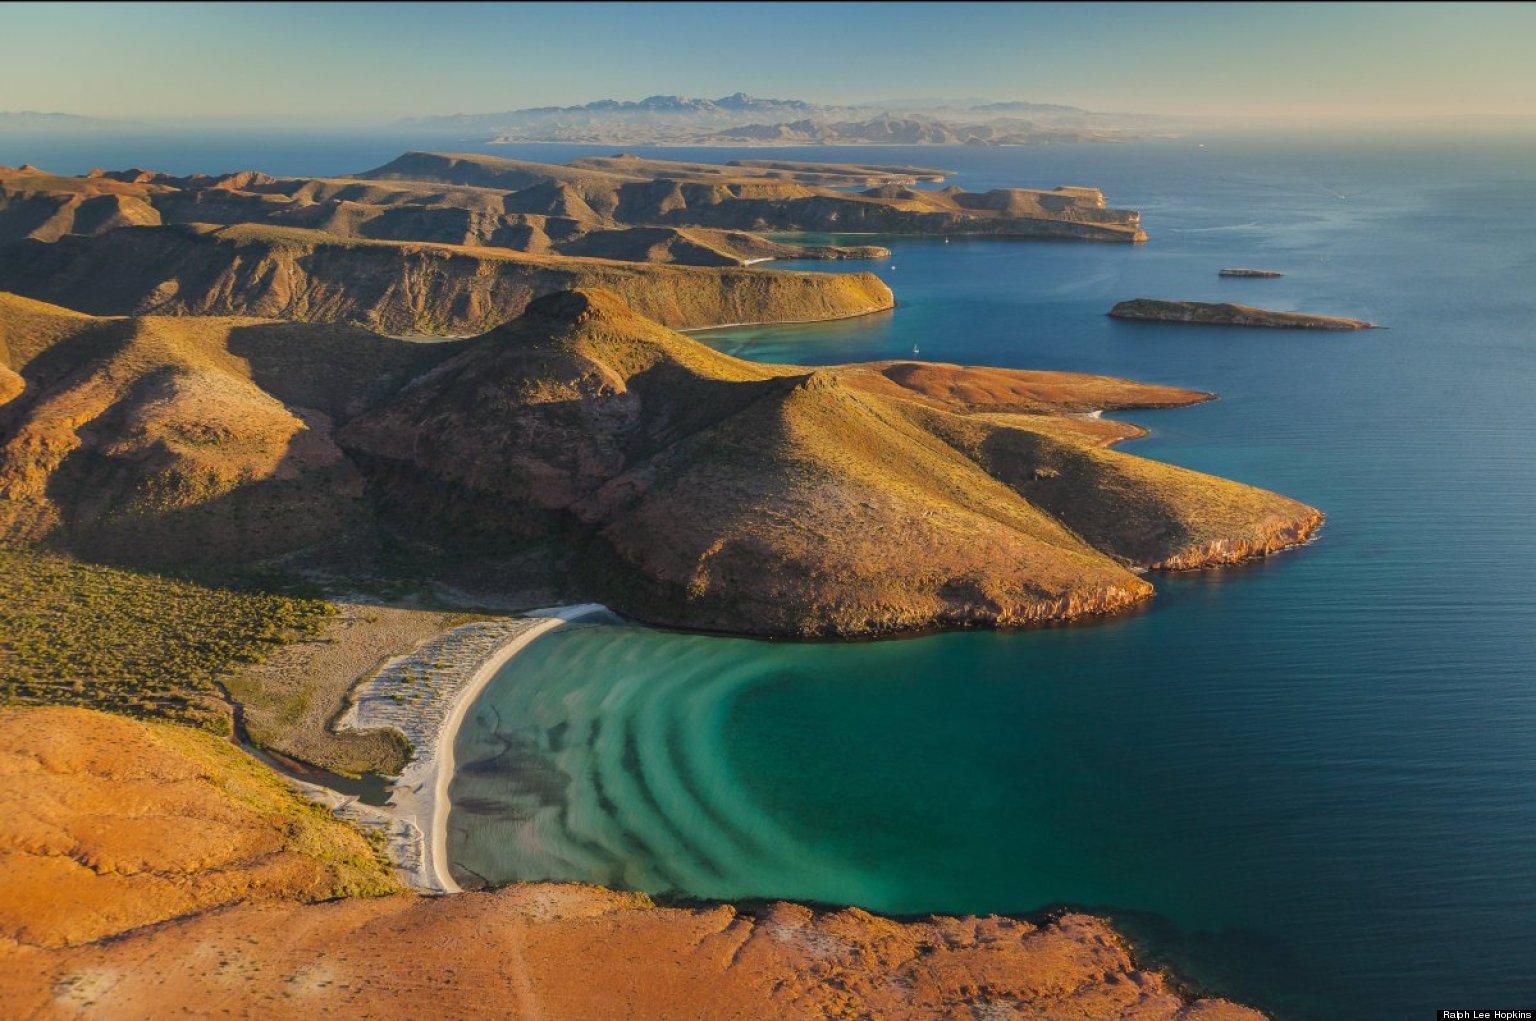 Wild Nature In Baja California And The Sea Of Cortez ...